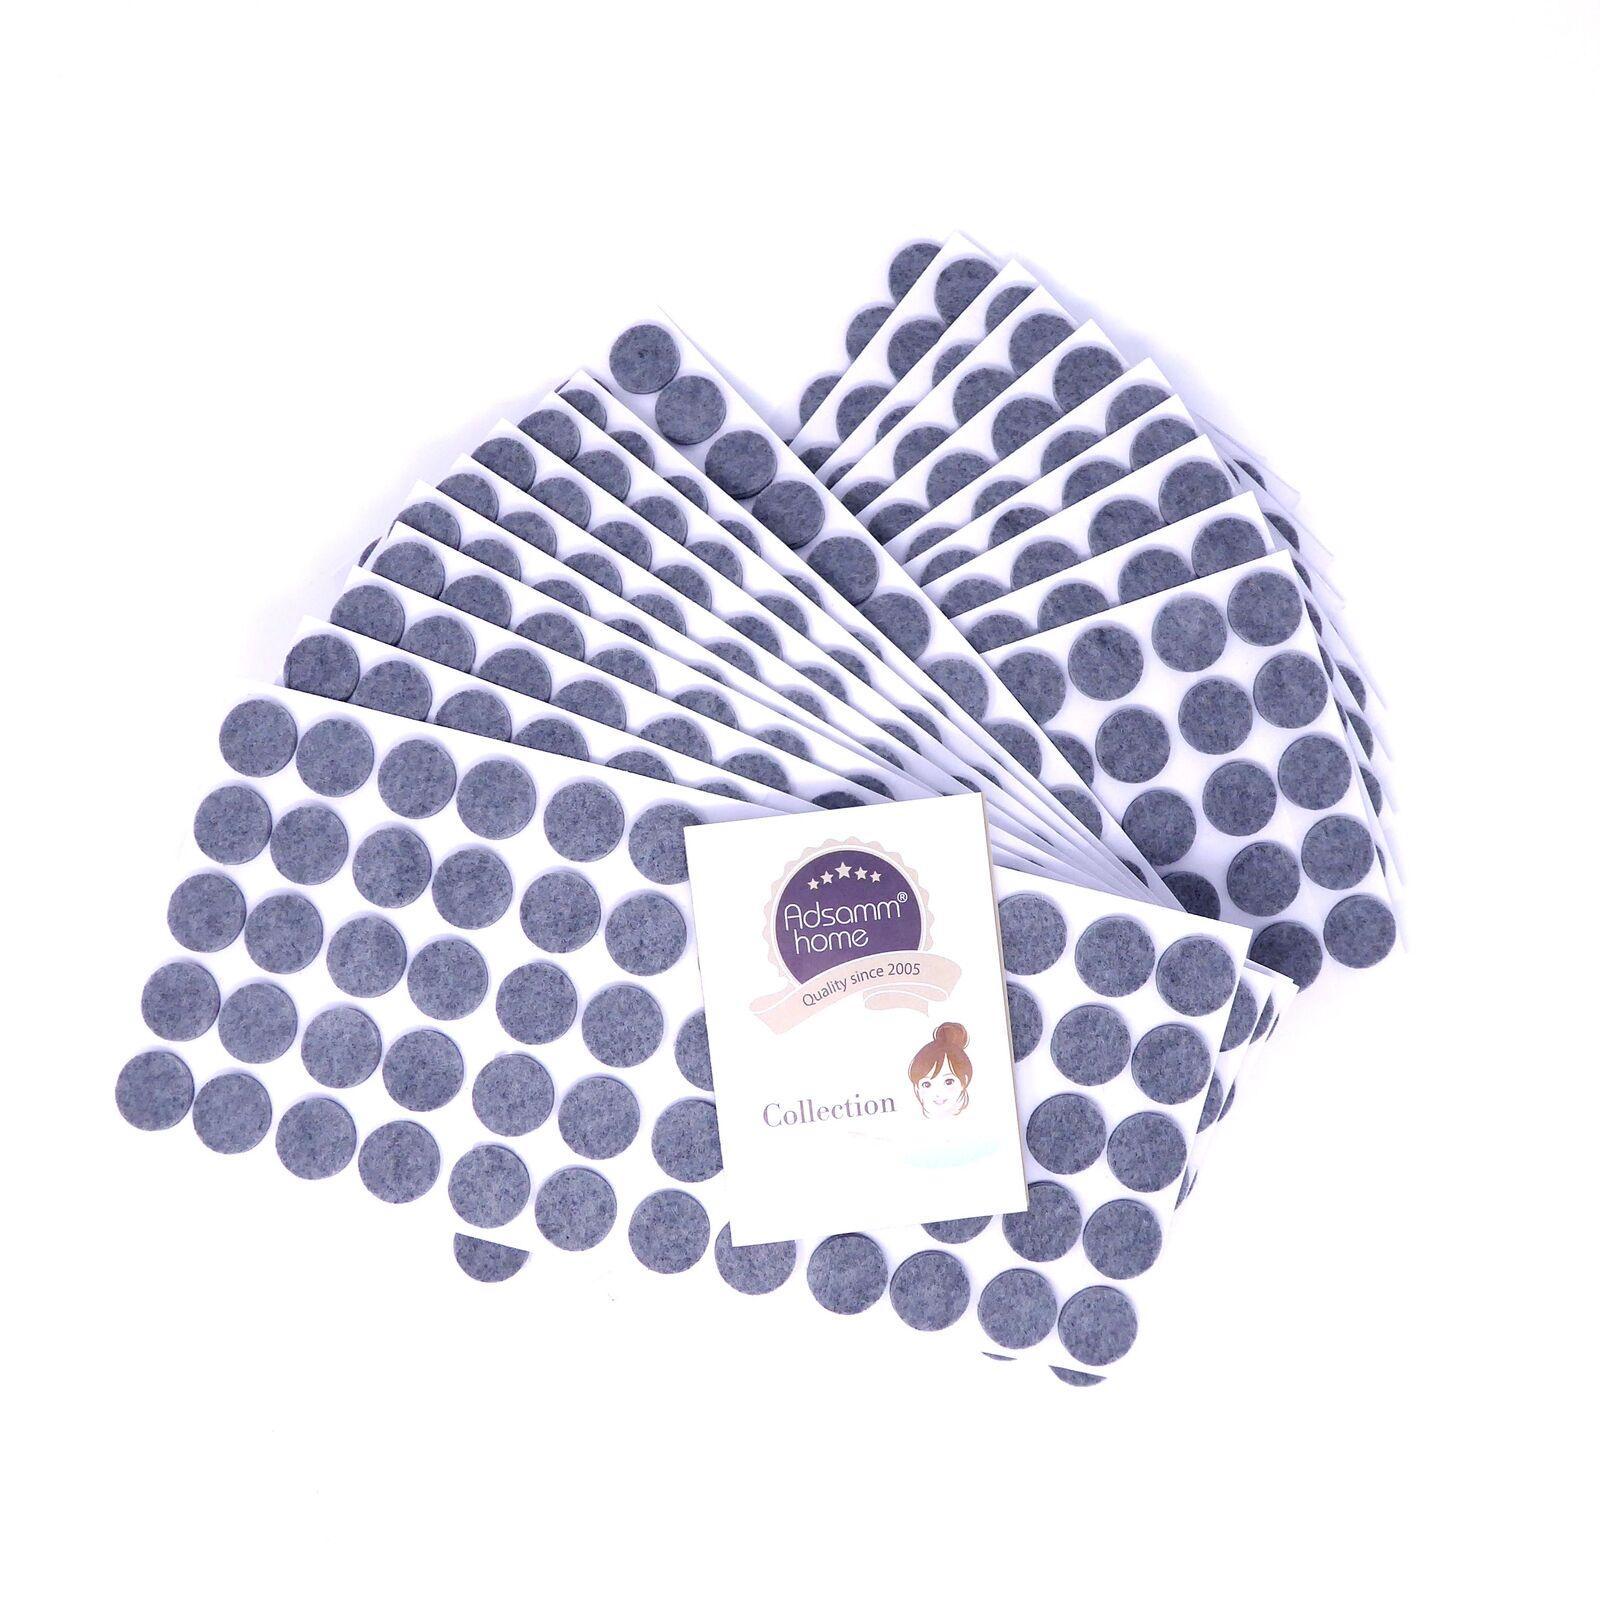 1200 x Felt-pads   Ø 0.79'' (Ø 20 mm)   grau   round   self-adhesive furniture g